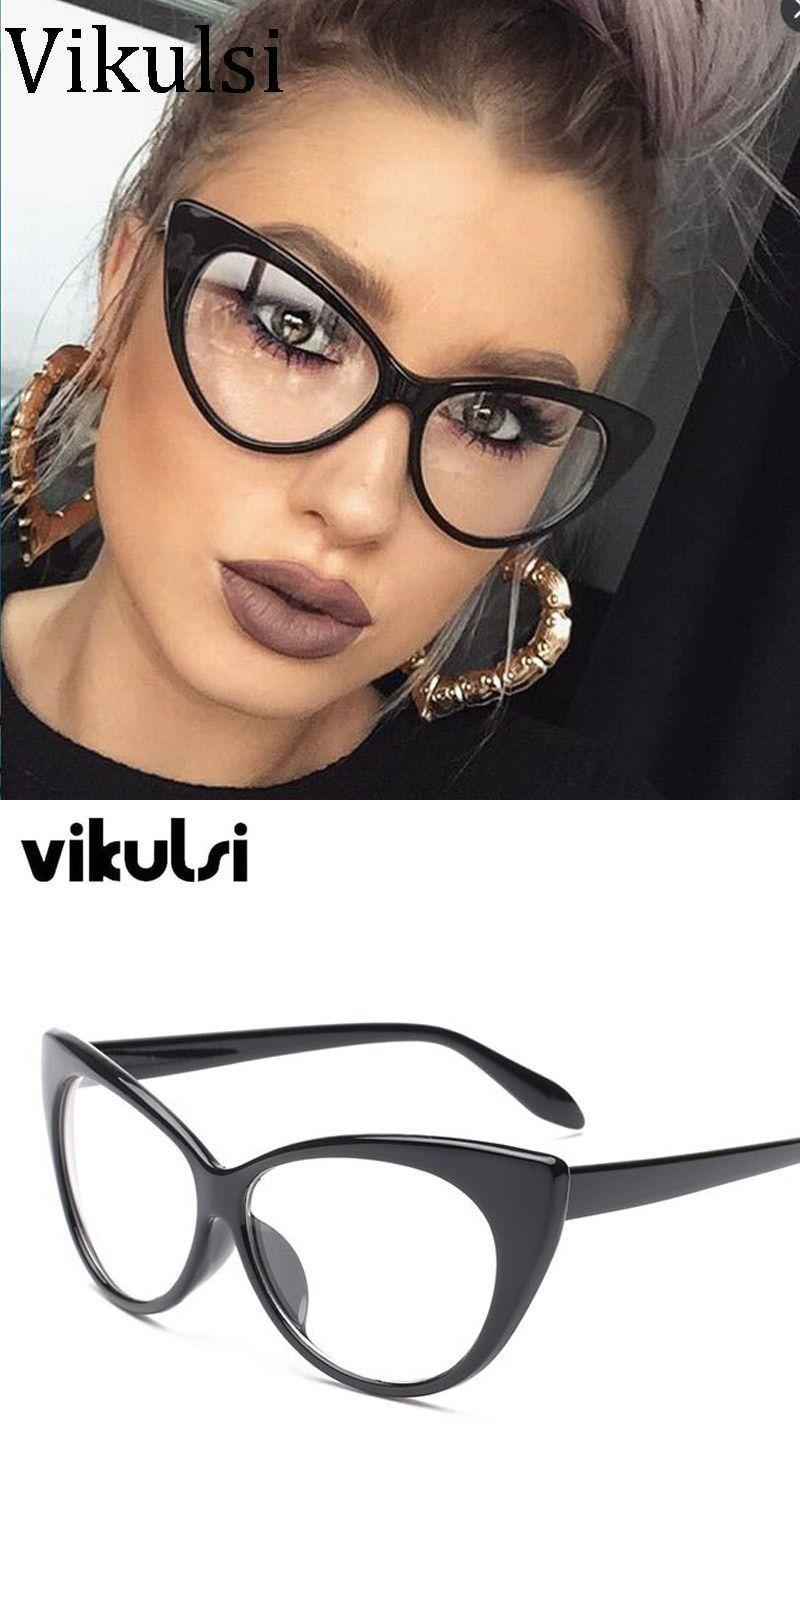 c740b20560ff New sexy cat eye optical glasses women transparent eyewear brand designer  vintage clear eyeglasses optical frame oculos  eyewear  accessories  frames   women ...